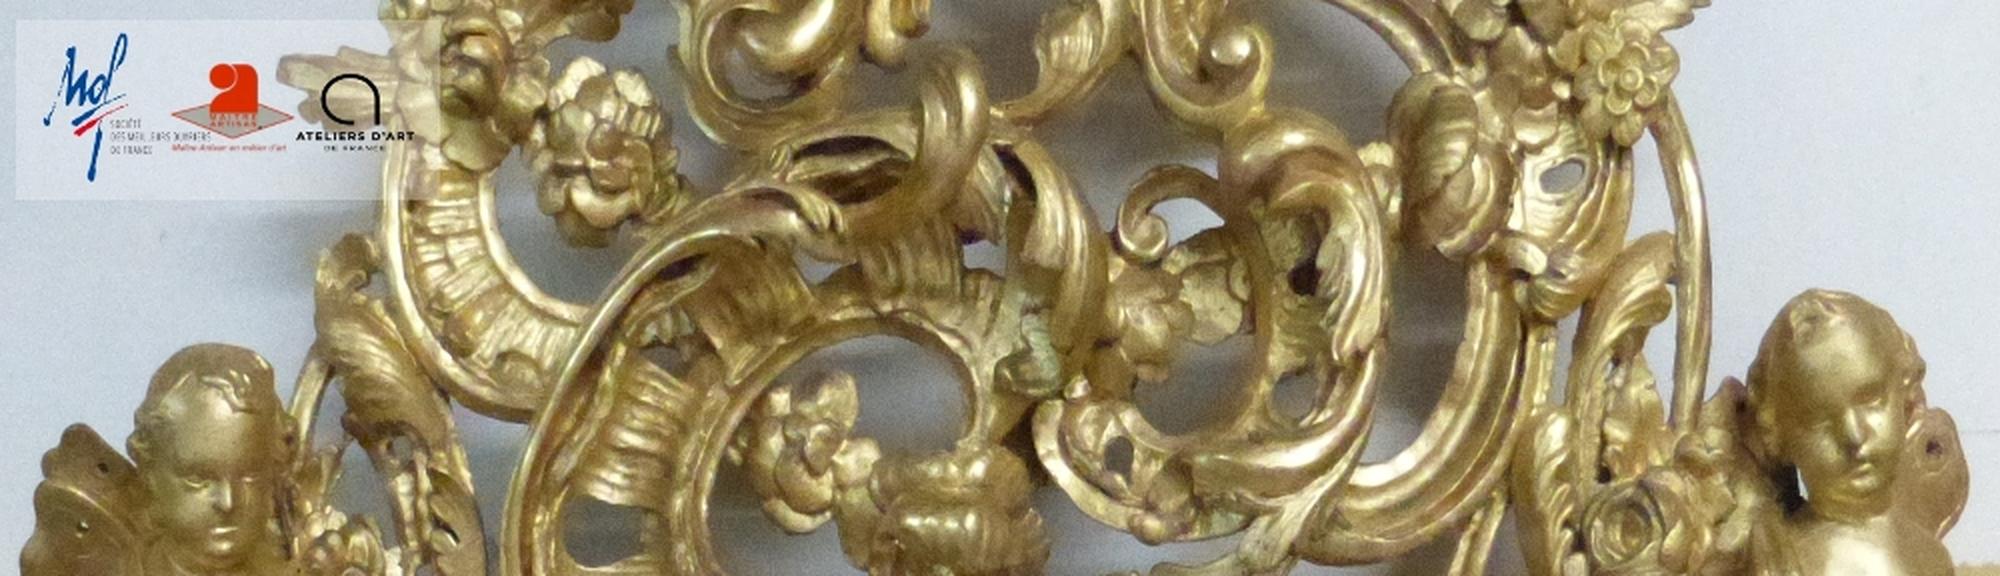 Miroir doré XVIIIème